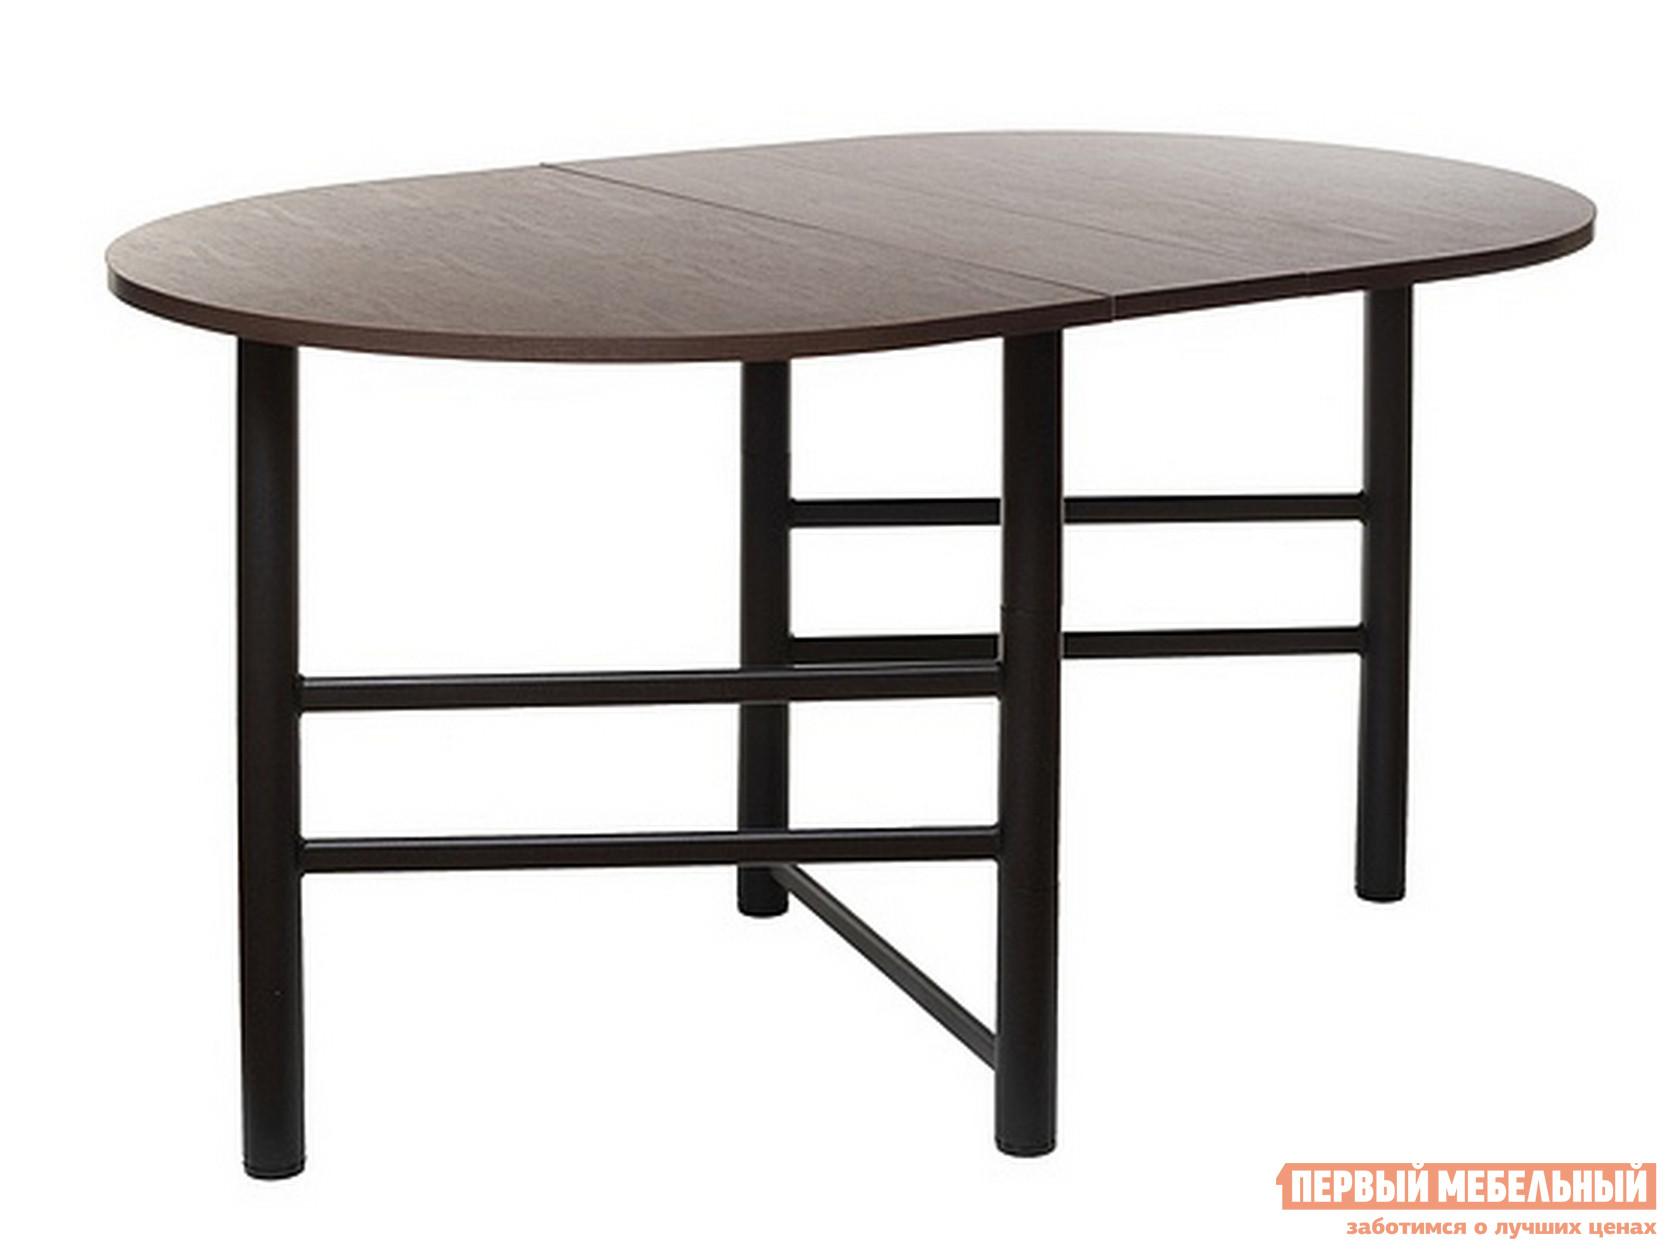 Кухонный стол  Стол Рим Венге — Стол Рим Венге